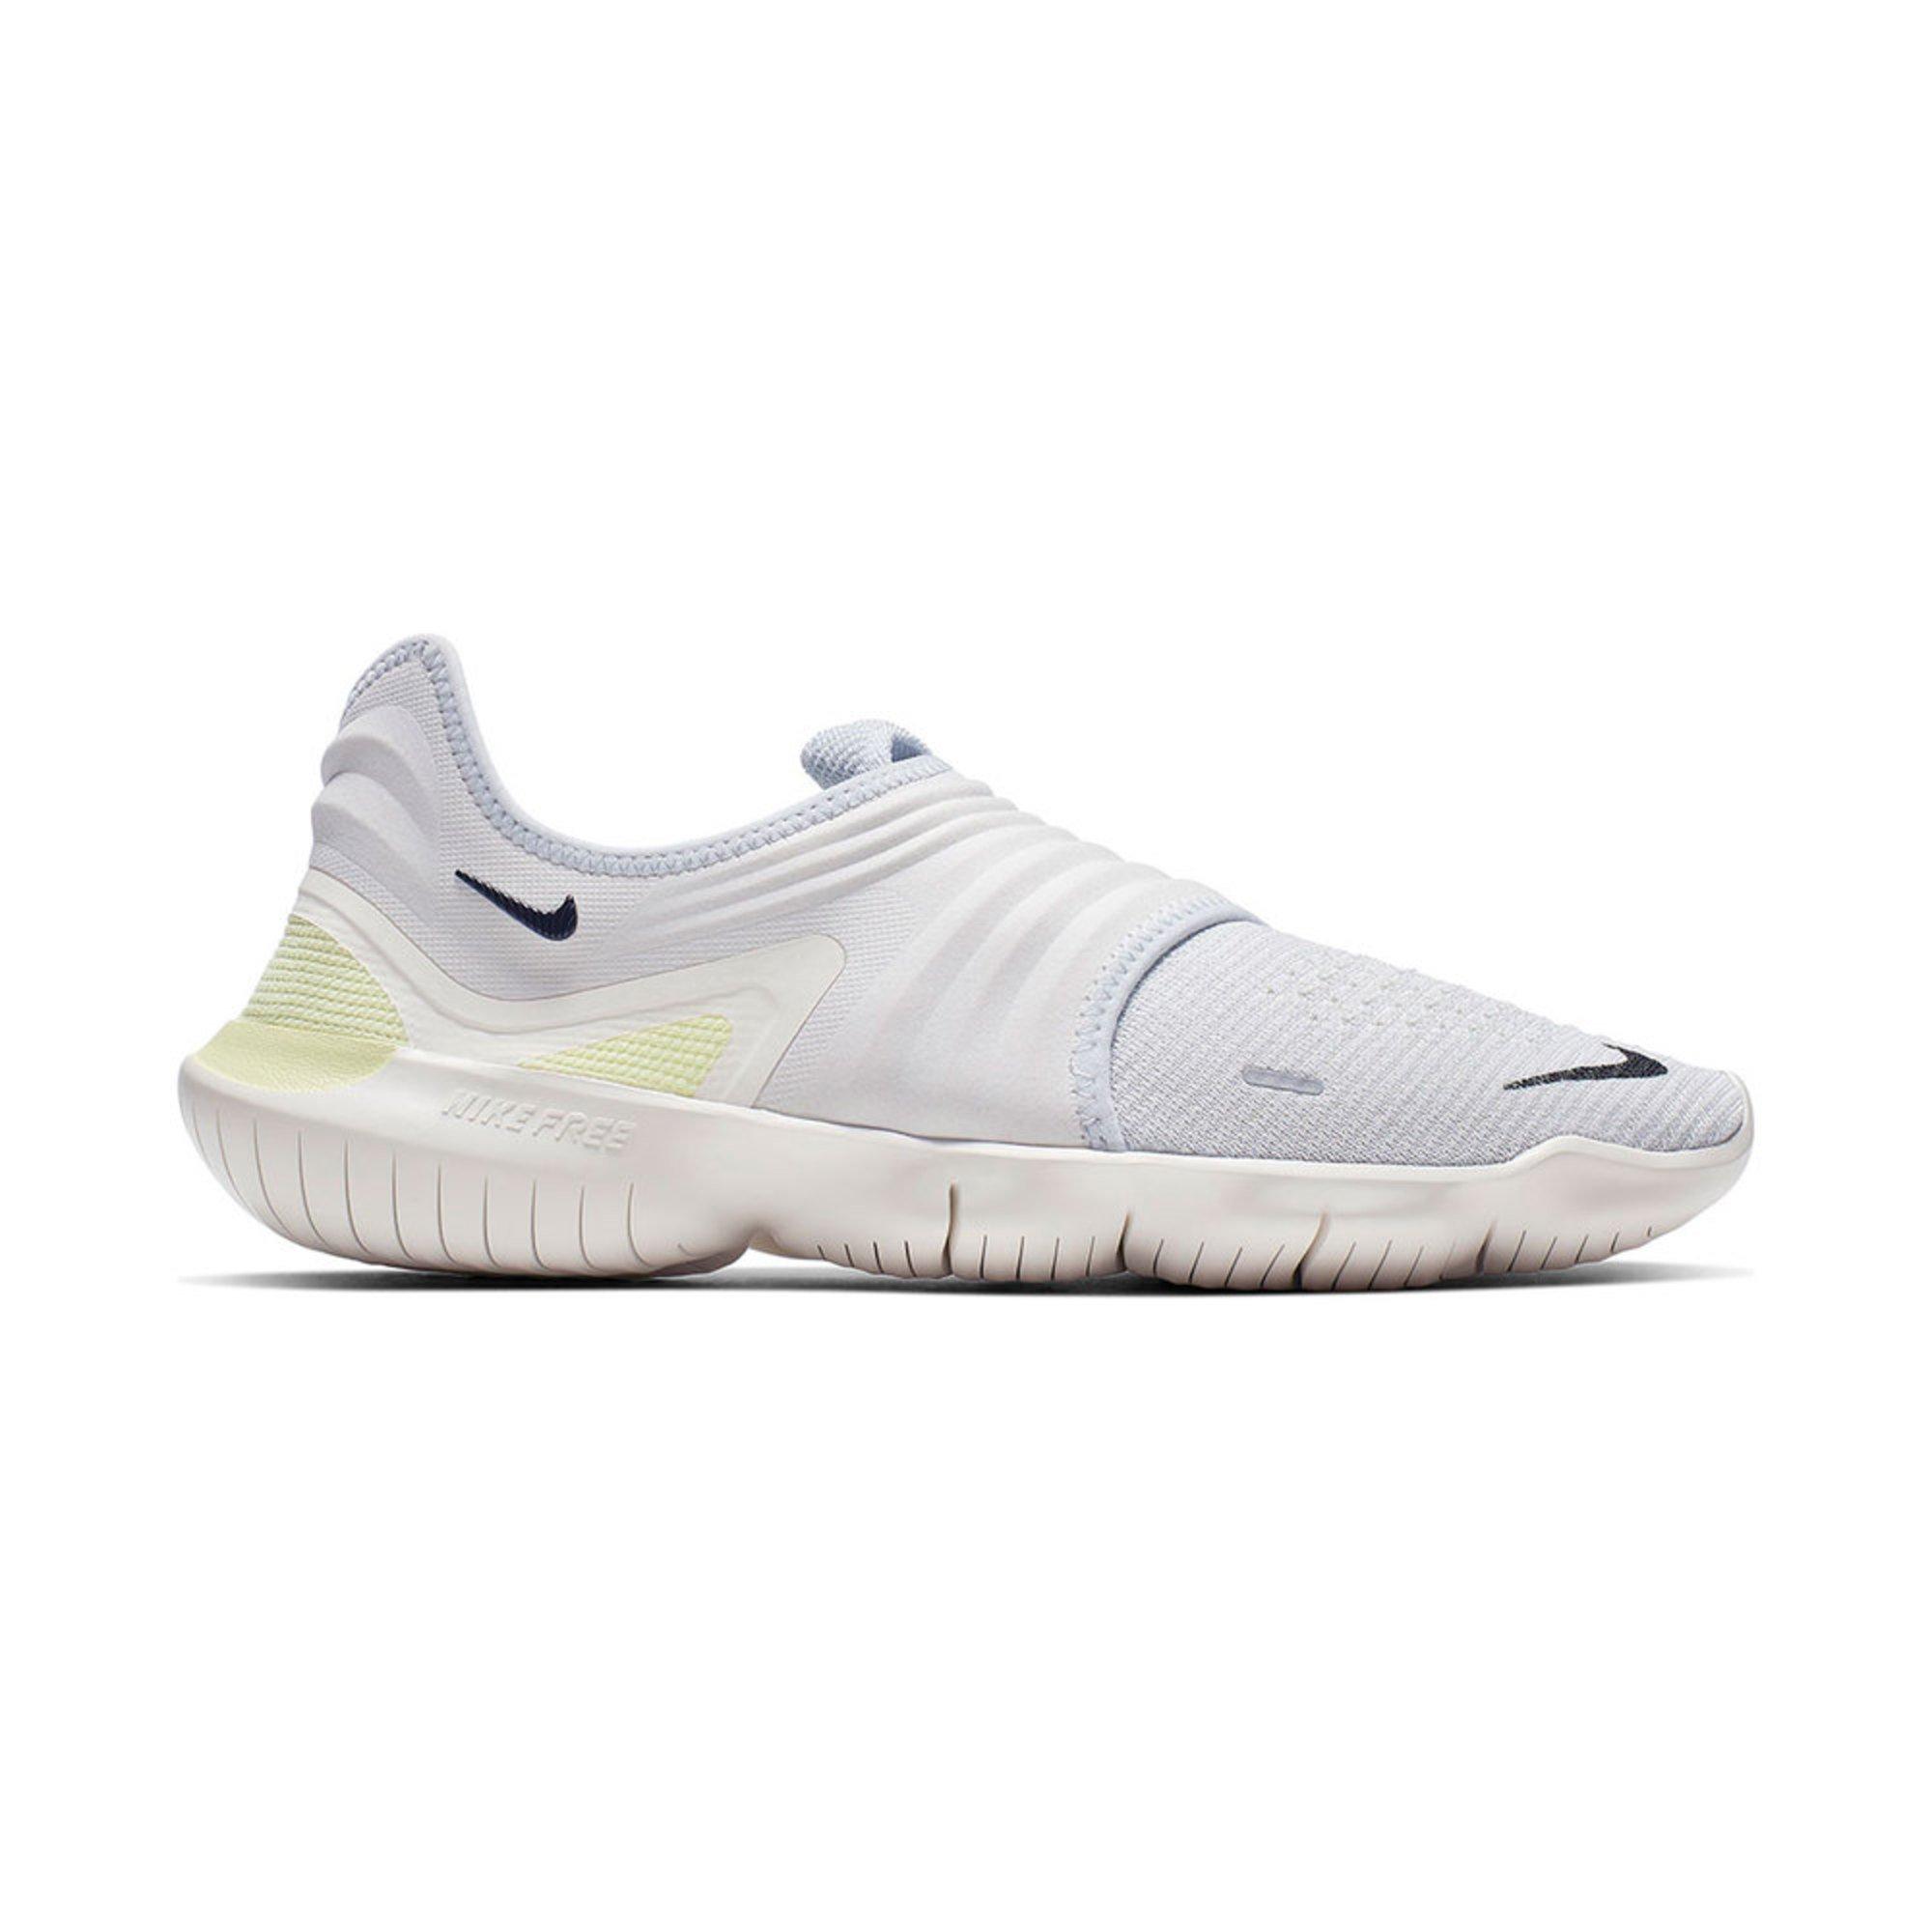 d8490a50cb Nike Men's Free Rn Flyknit 3.0 Running Shoe | Men's Running Shoes ...